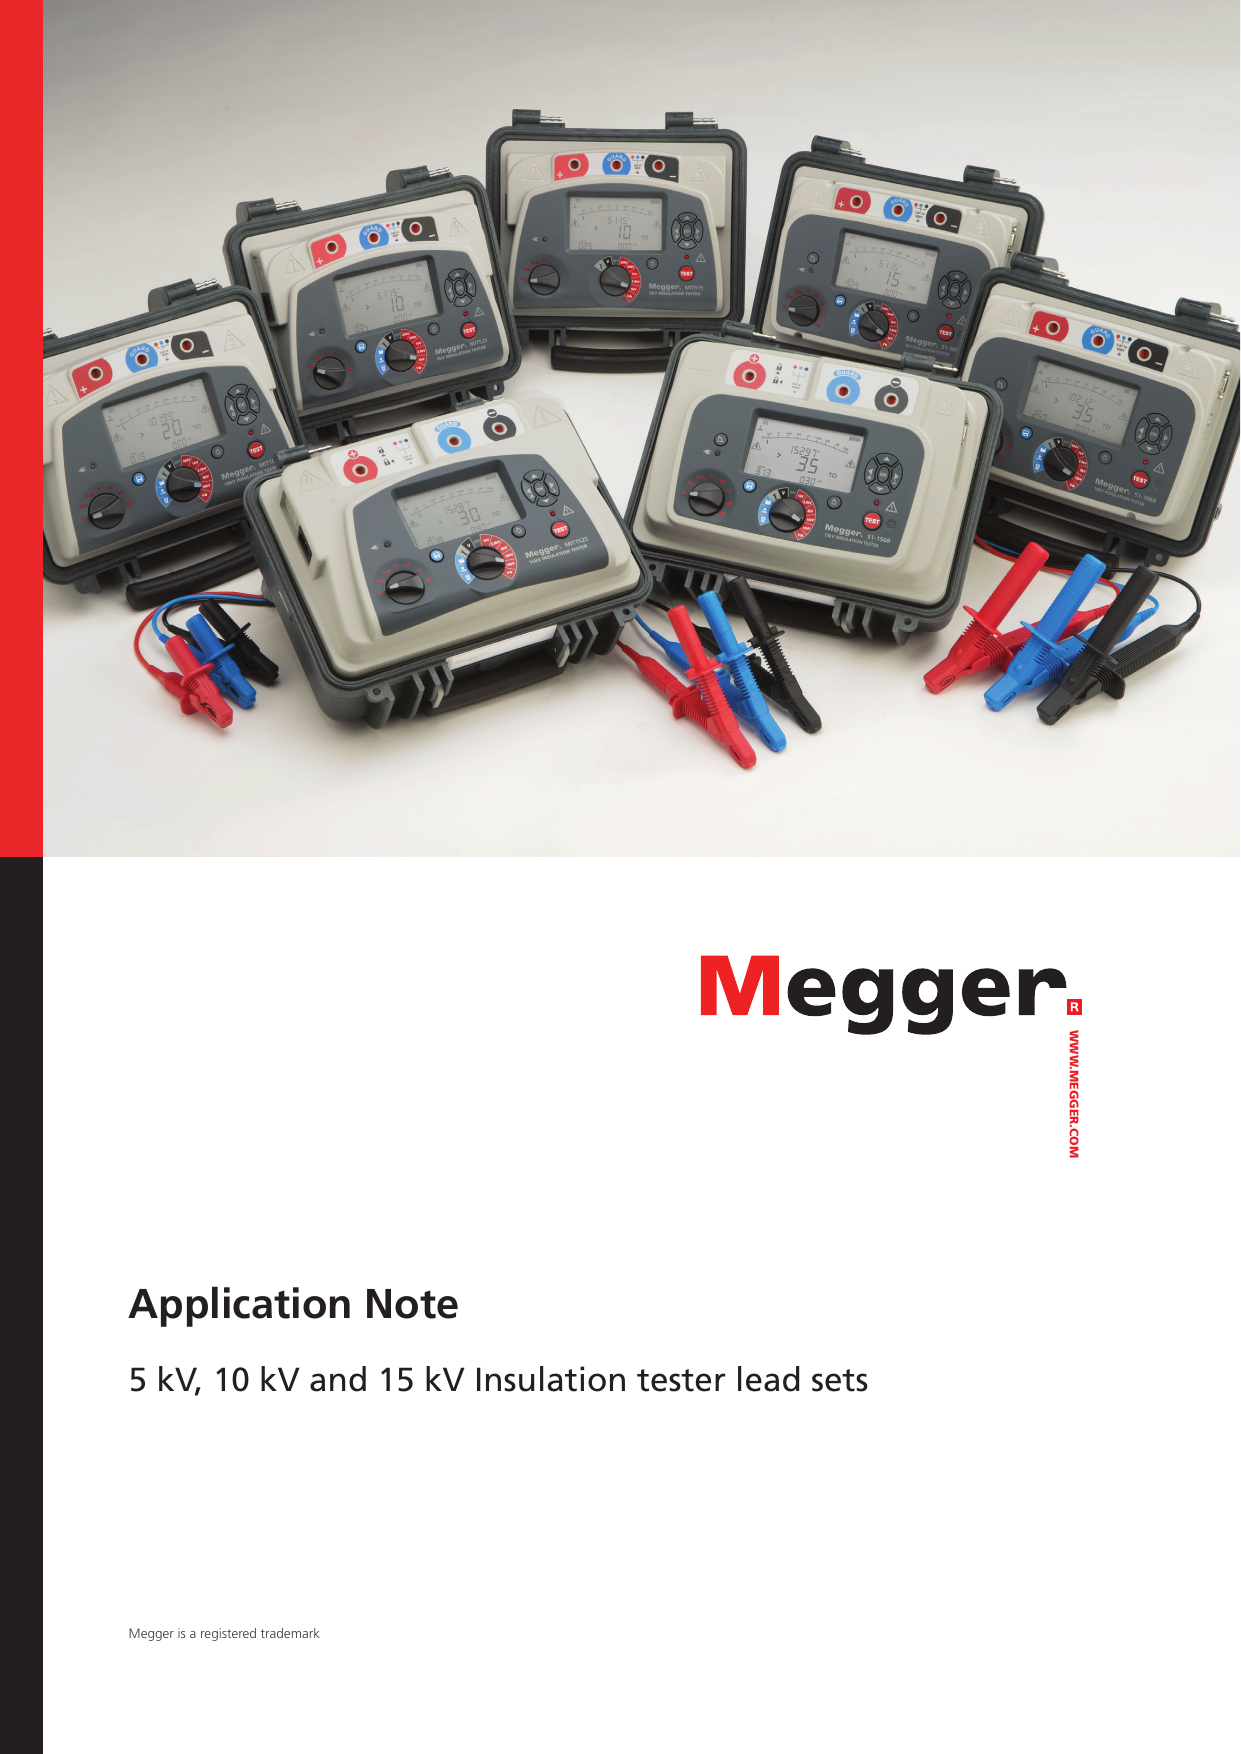 10kV Test Voltage Megger 1002-534 3-Piece Insulated Lead Clips Set 9.8 Length